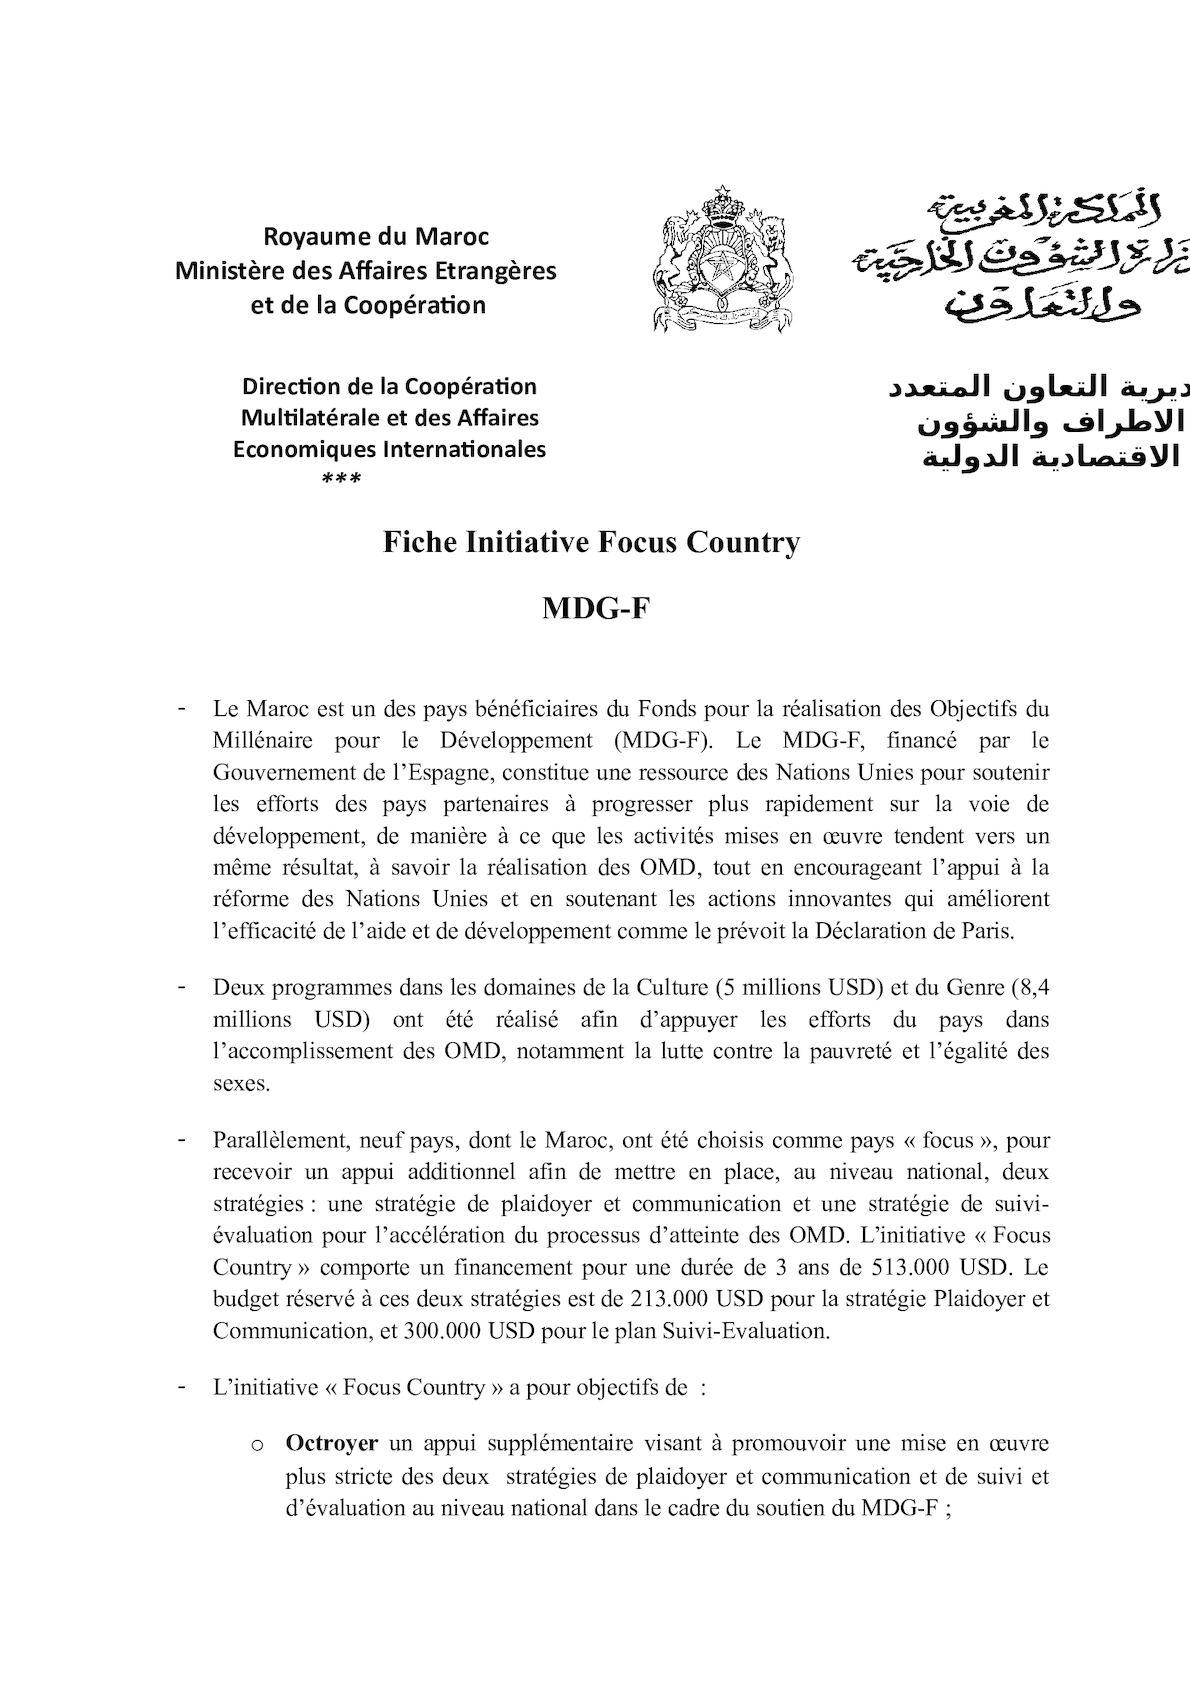 Fiche Initiative Focus Country (MDG F).